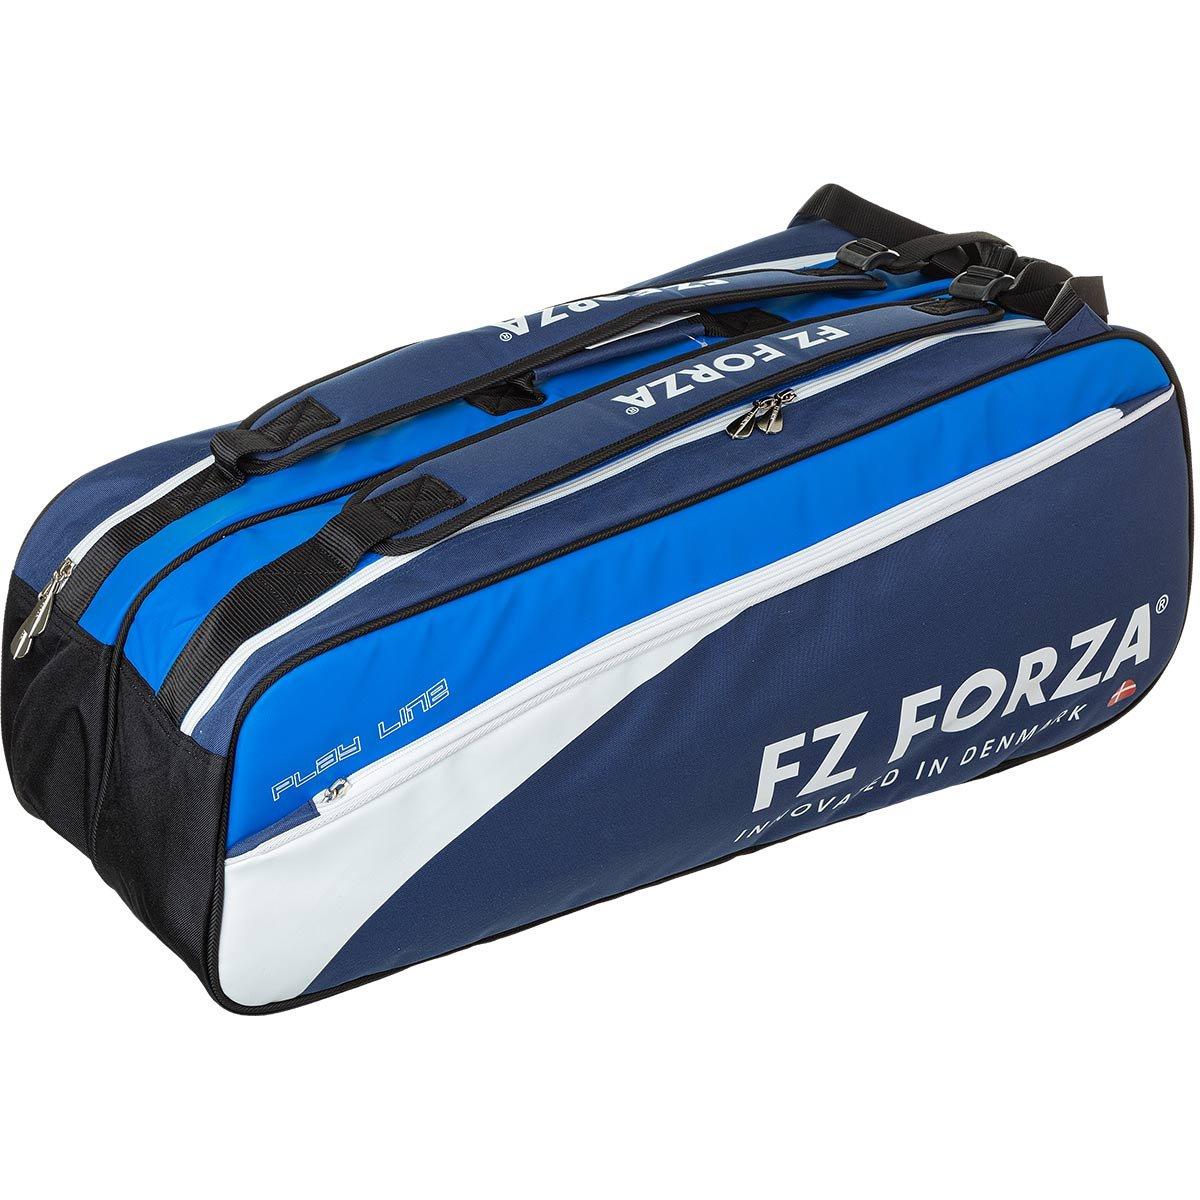 Køb FZ FORZA Play Line Badmintontaske – french blue